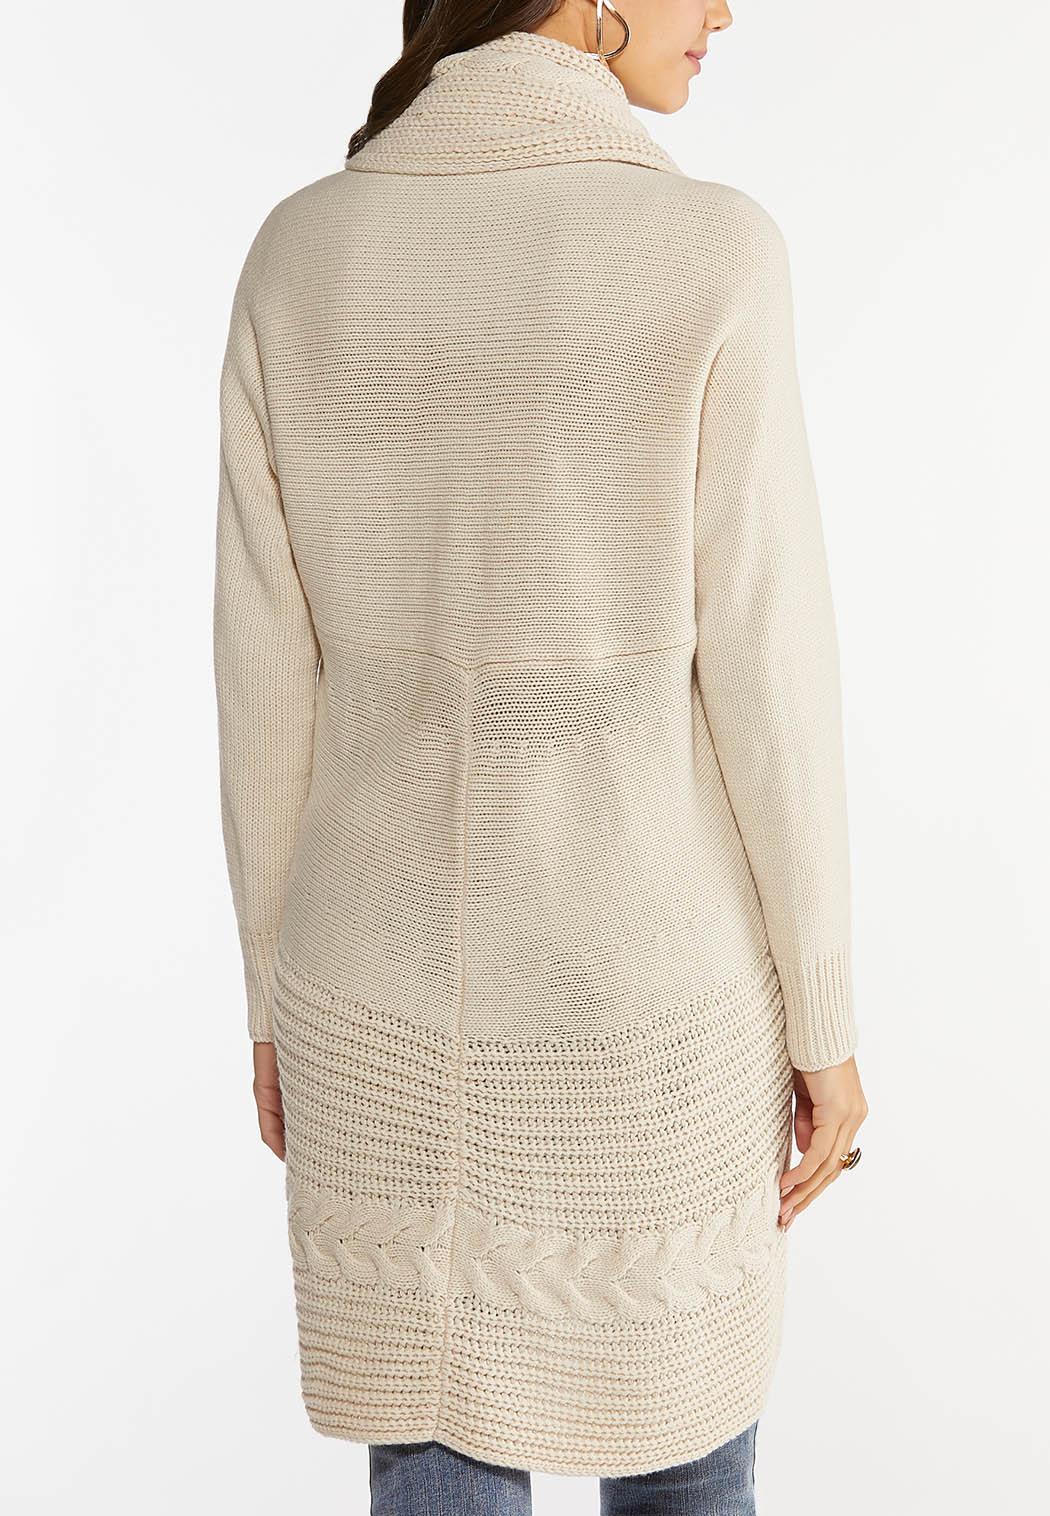 Plus Size Cable Collar Cardigan Sweater (Item #44439913)